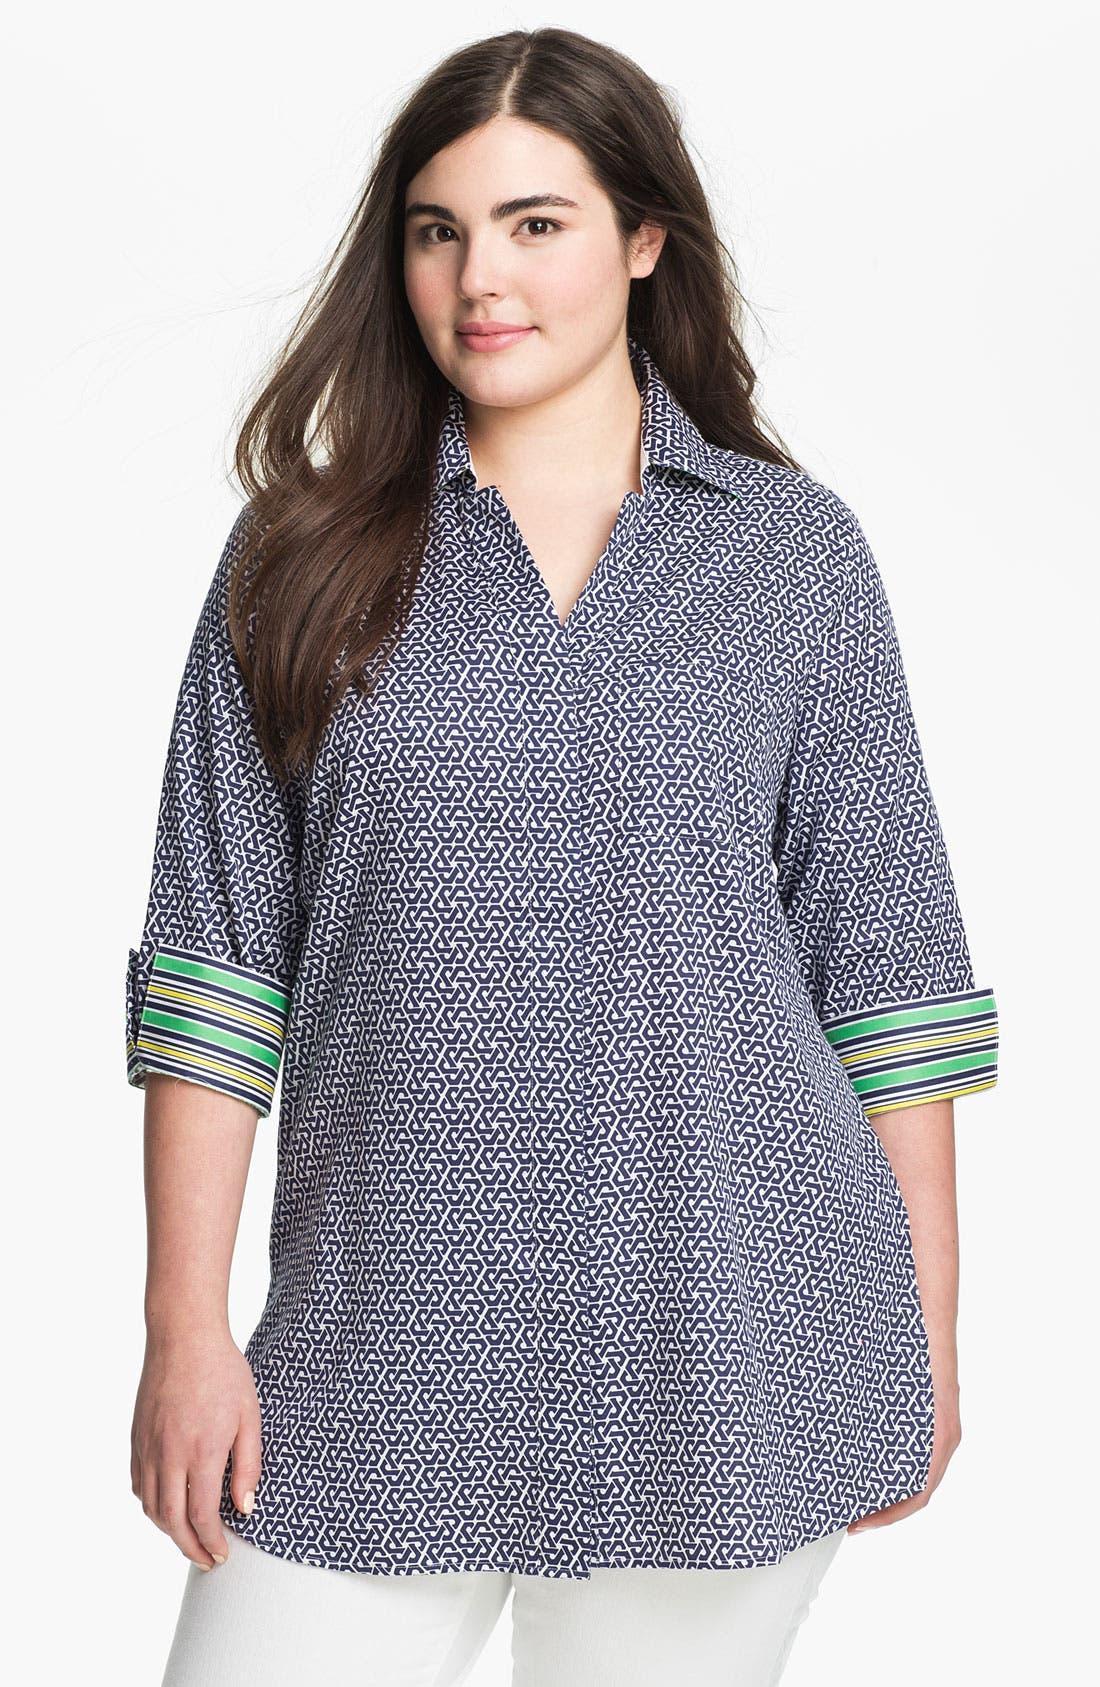 Alternate Image 1 Selected - Foxcroft Status Print Shaped Tunic (Plus Size)